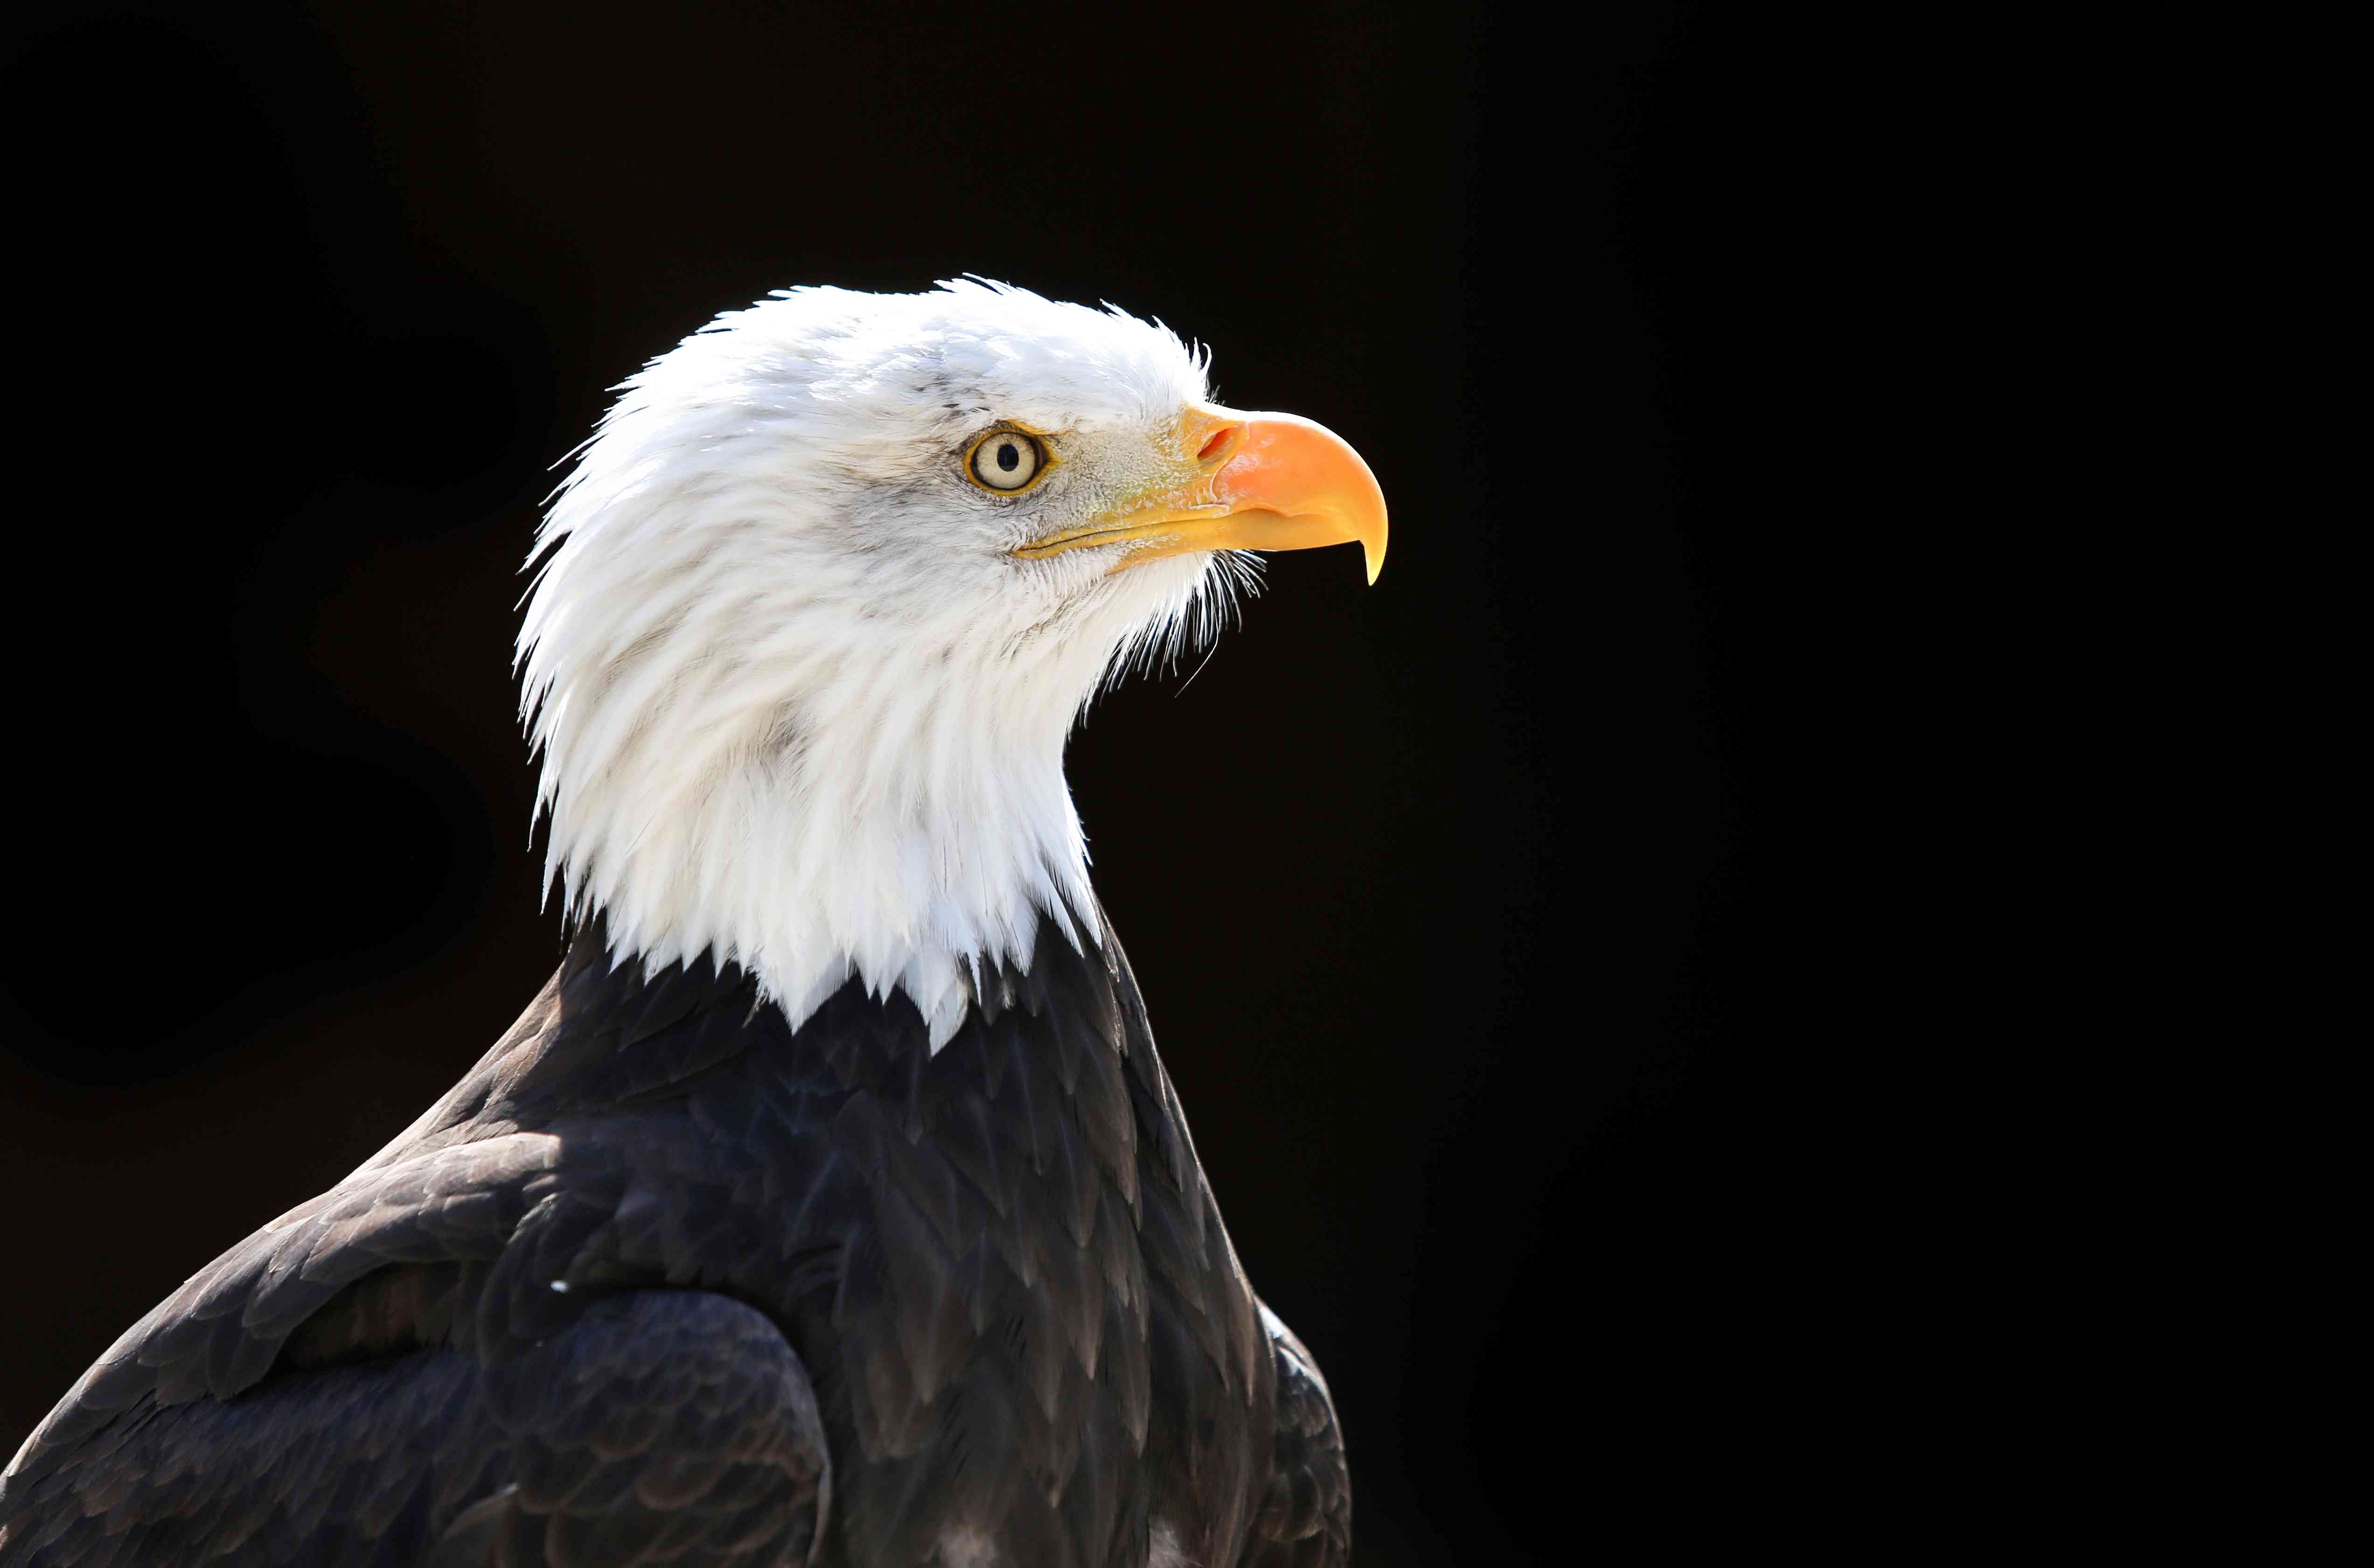 Photo of the head of a Bald Eagle